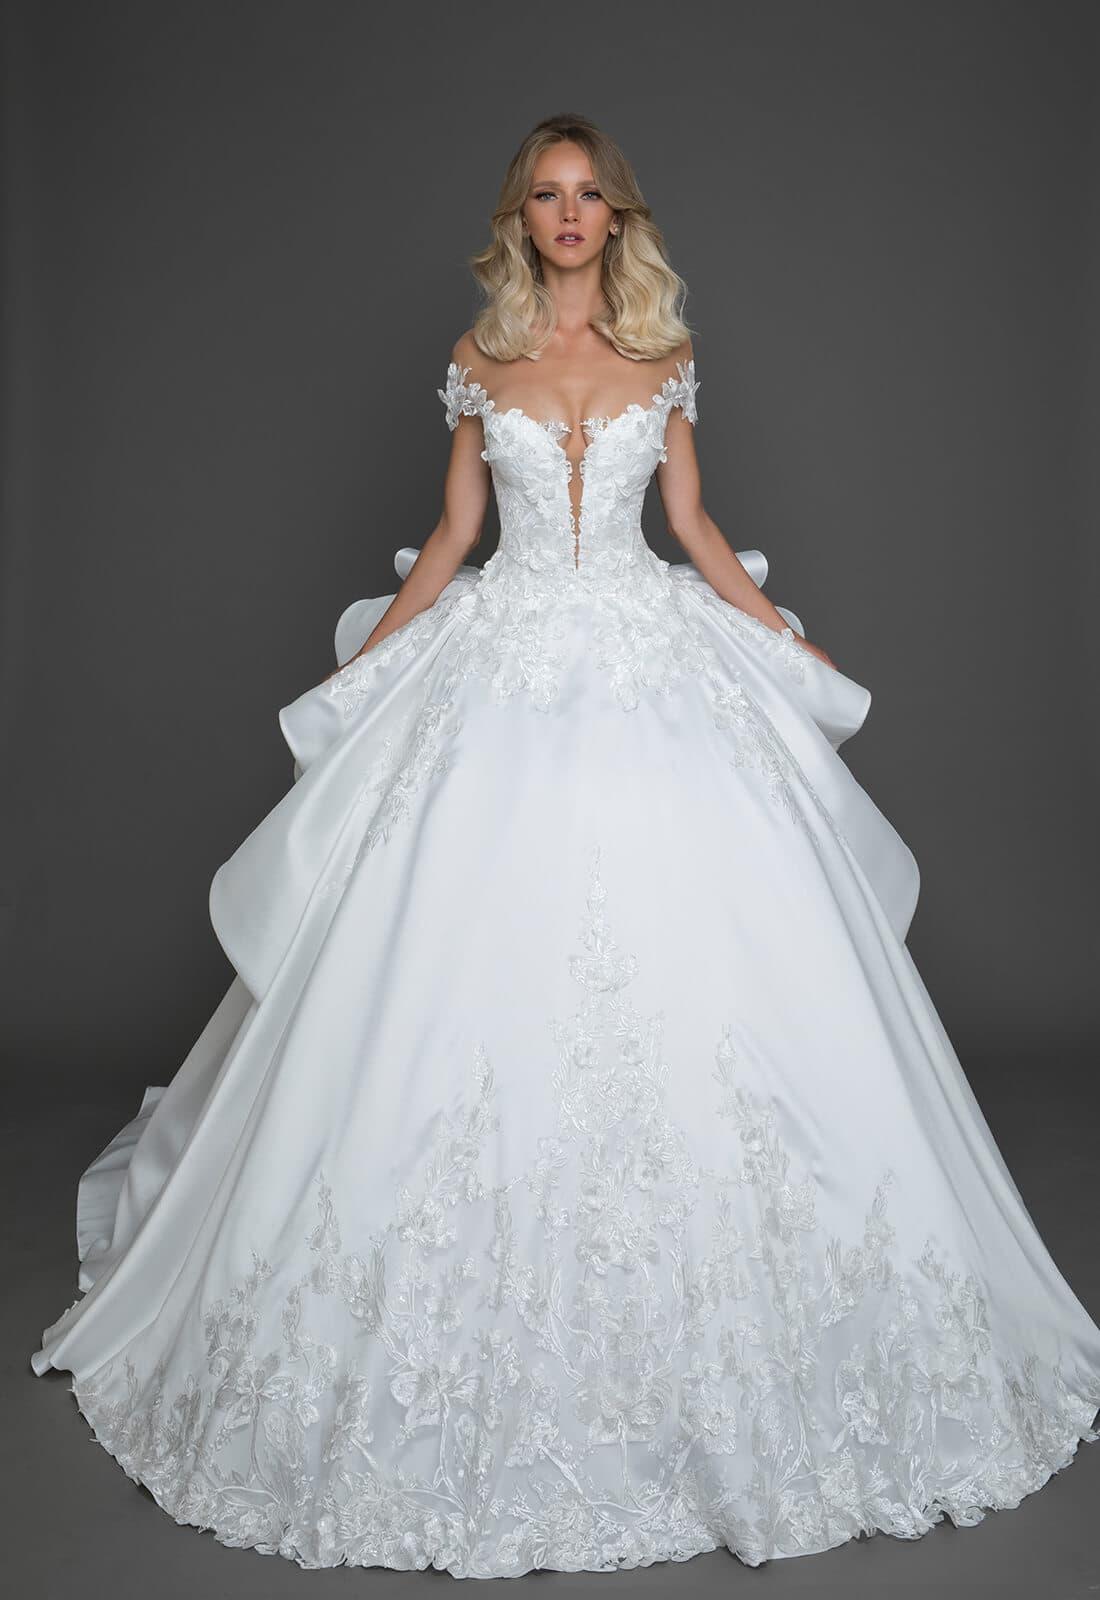 kleinfeld plus size wedding dresses photo - 1